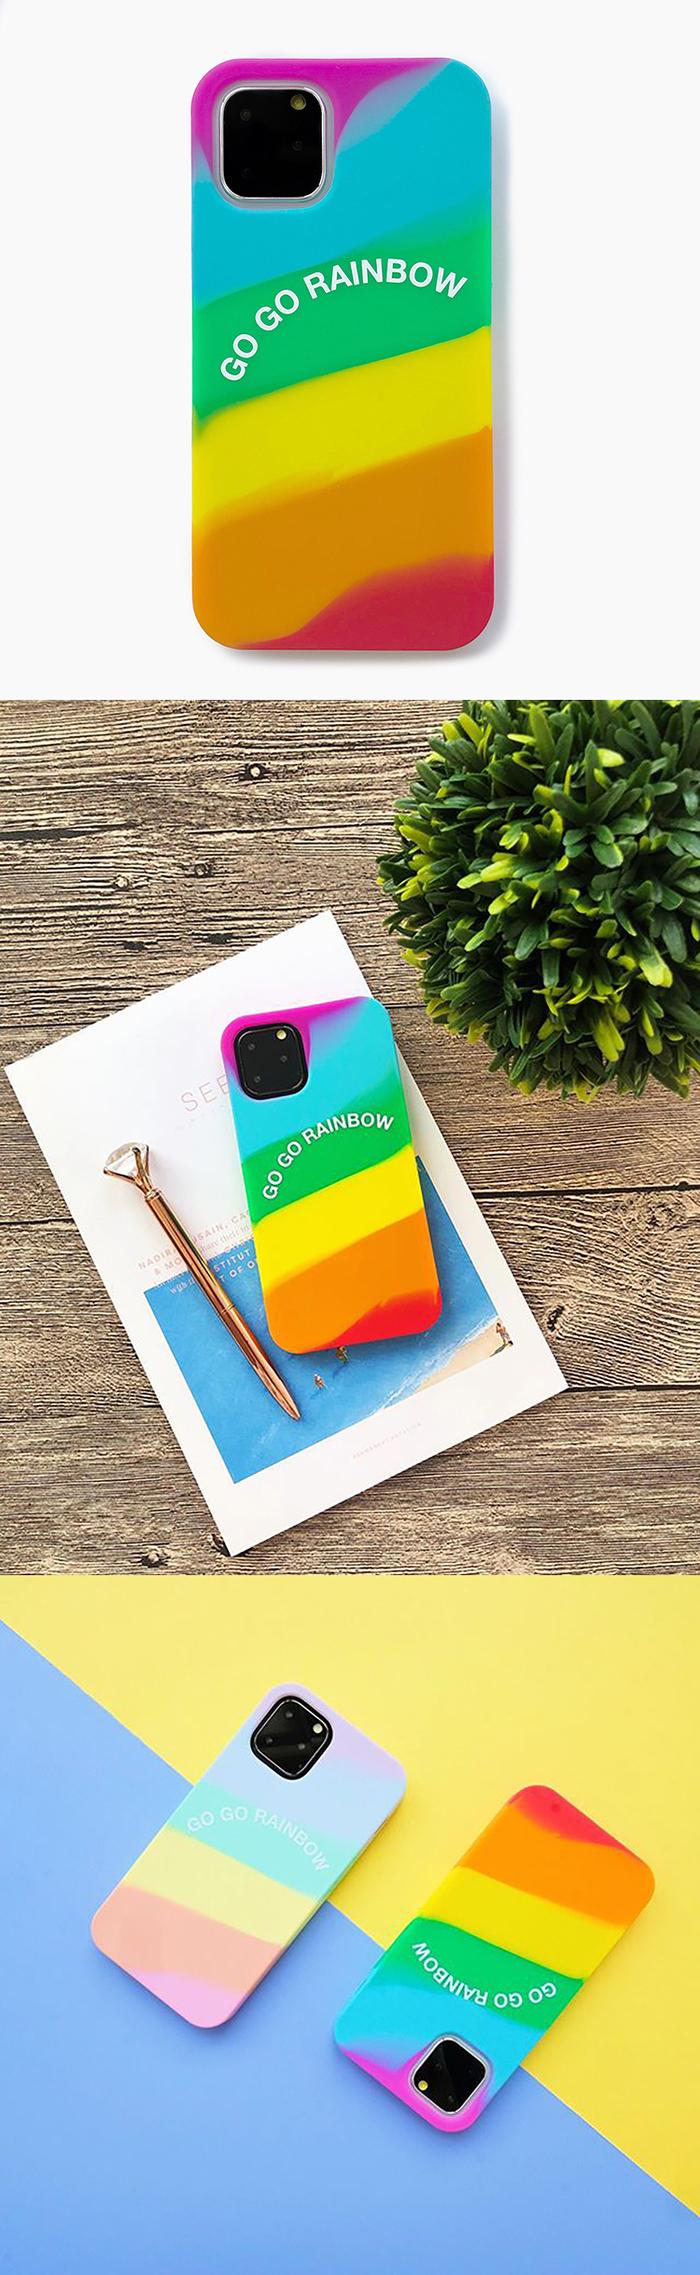 Candies Simple系列 愛之彩虹 - iPhone 11 Pro